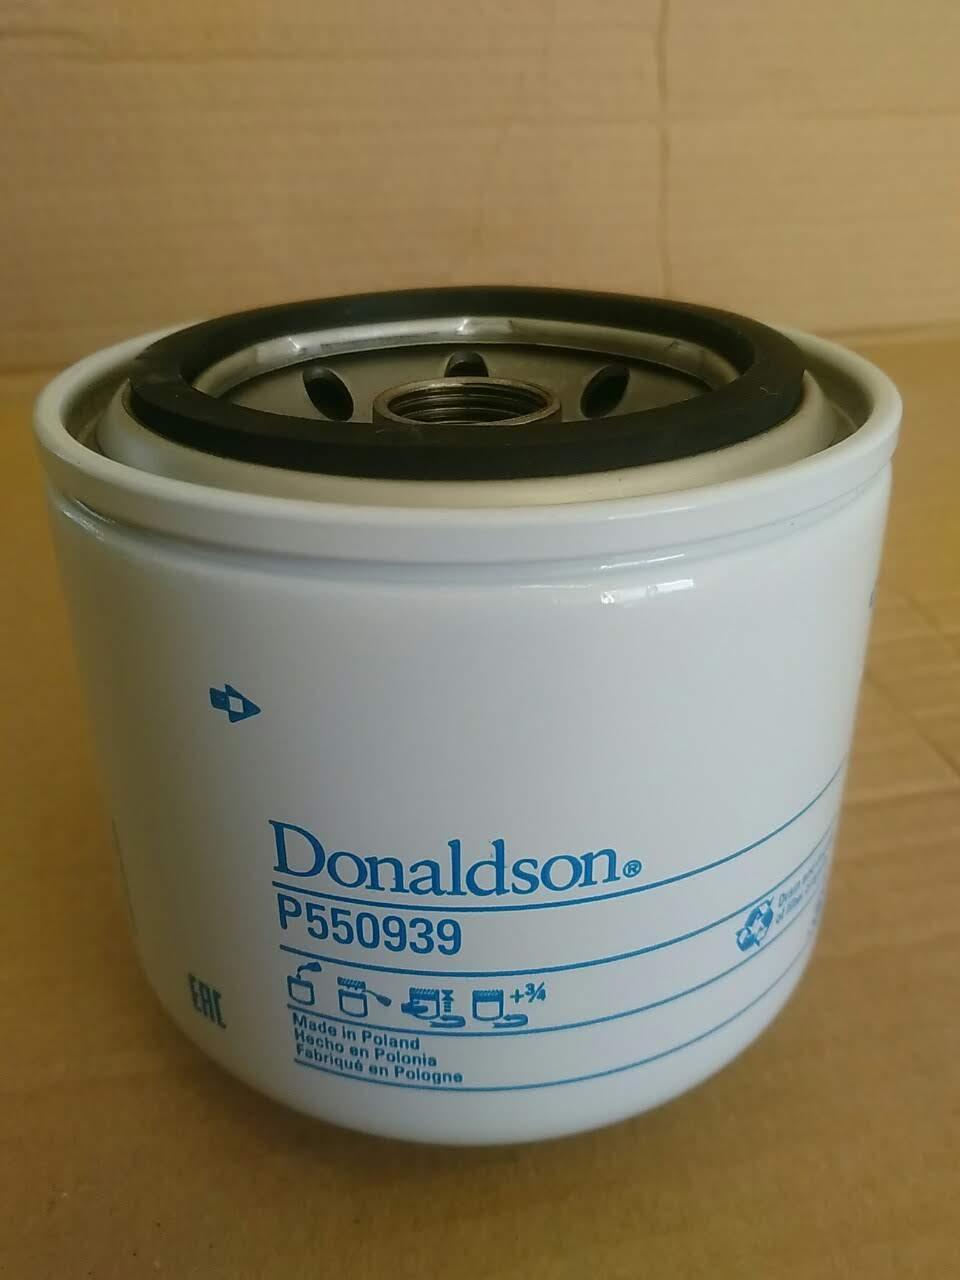 STILL 54022225017 Donaldson P550939 фильтр масляный / фільтр оливний